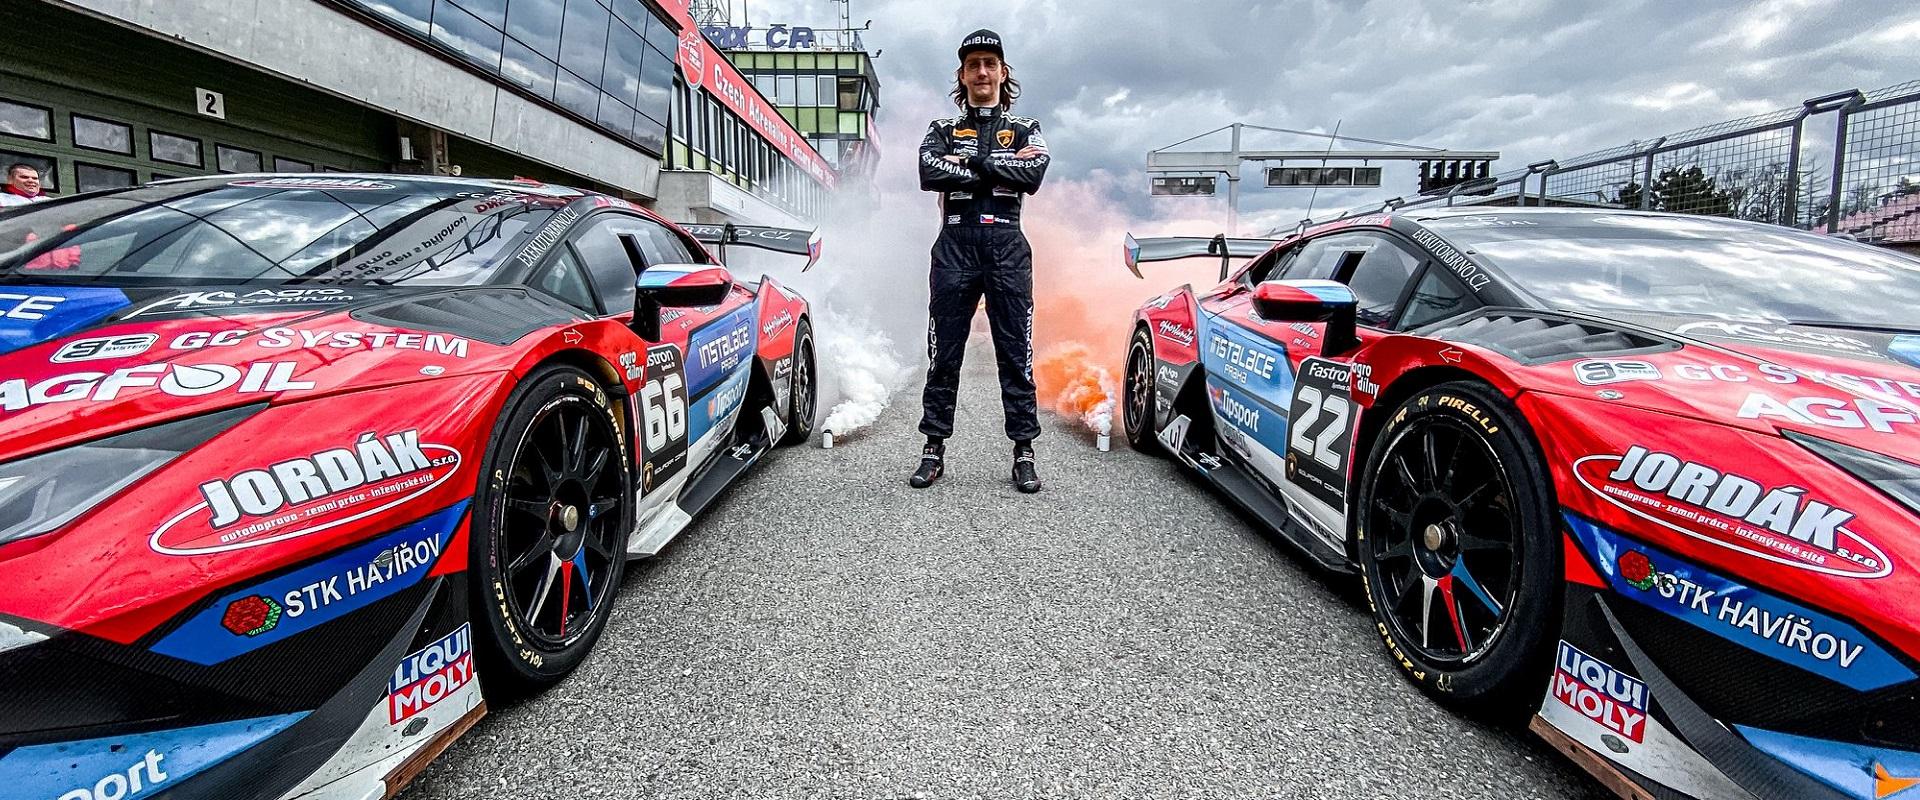 ROLL OUT 2020 Mičánek Motorsport powered by Buggyra